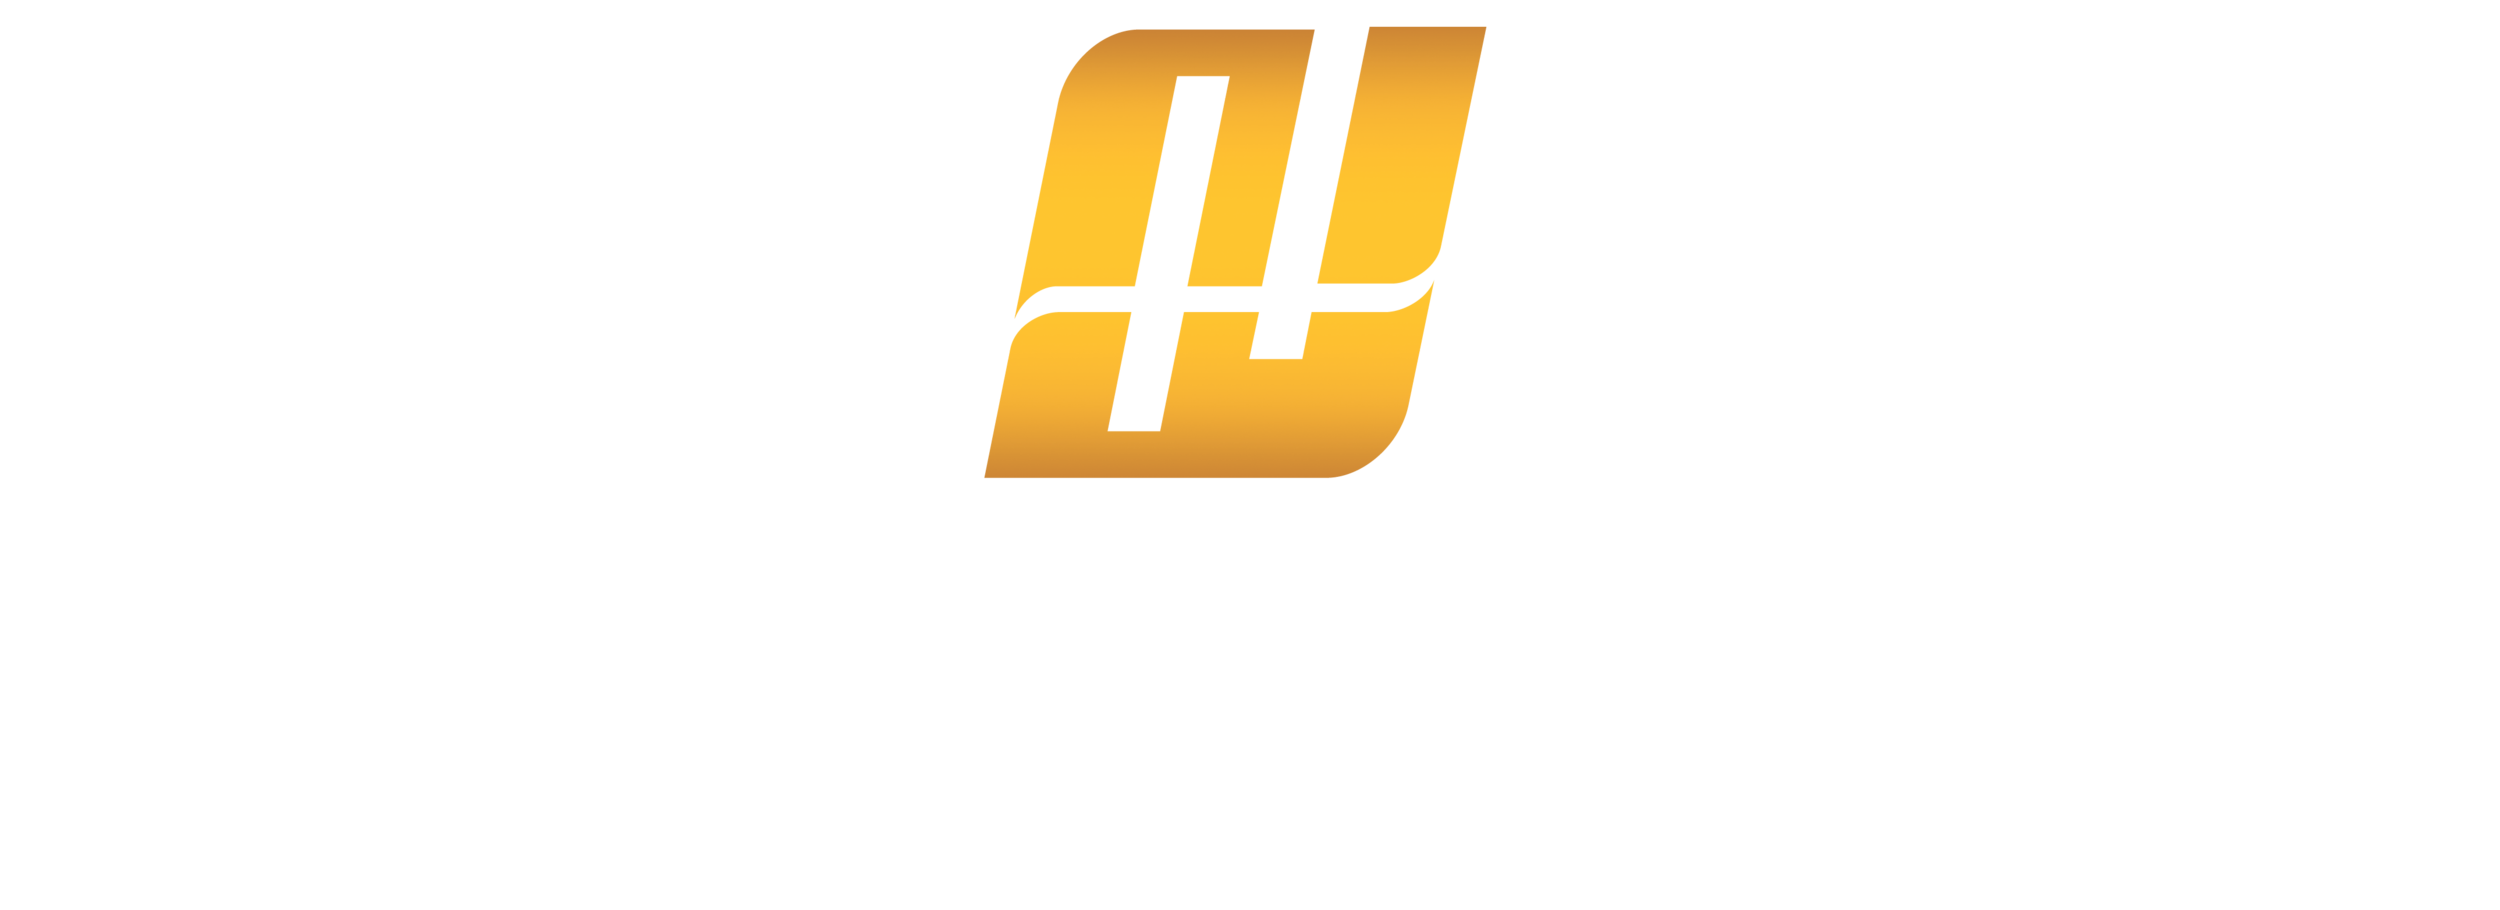 heg-logo-white-gold-print.png